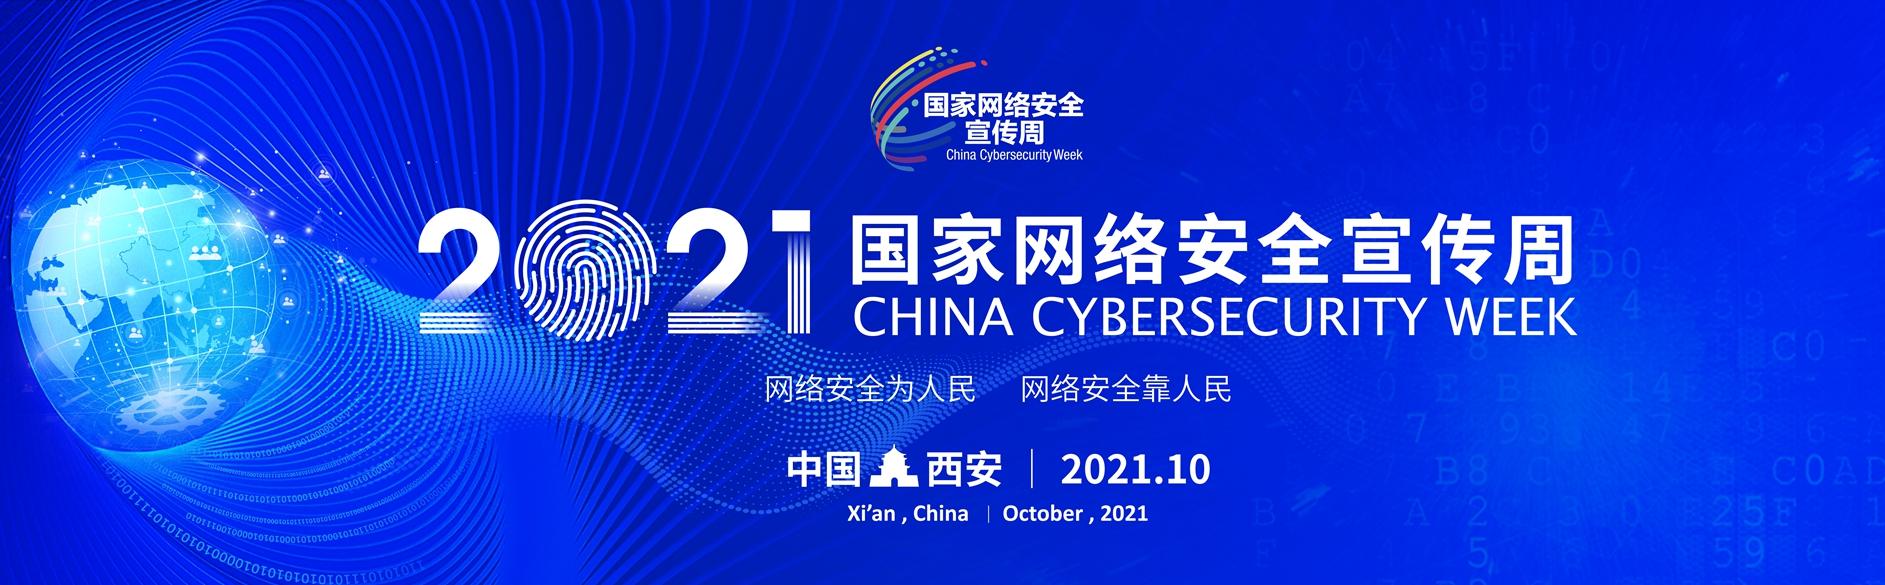 2021年國家網路安全宣傳周